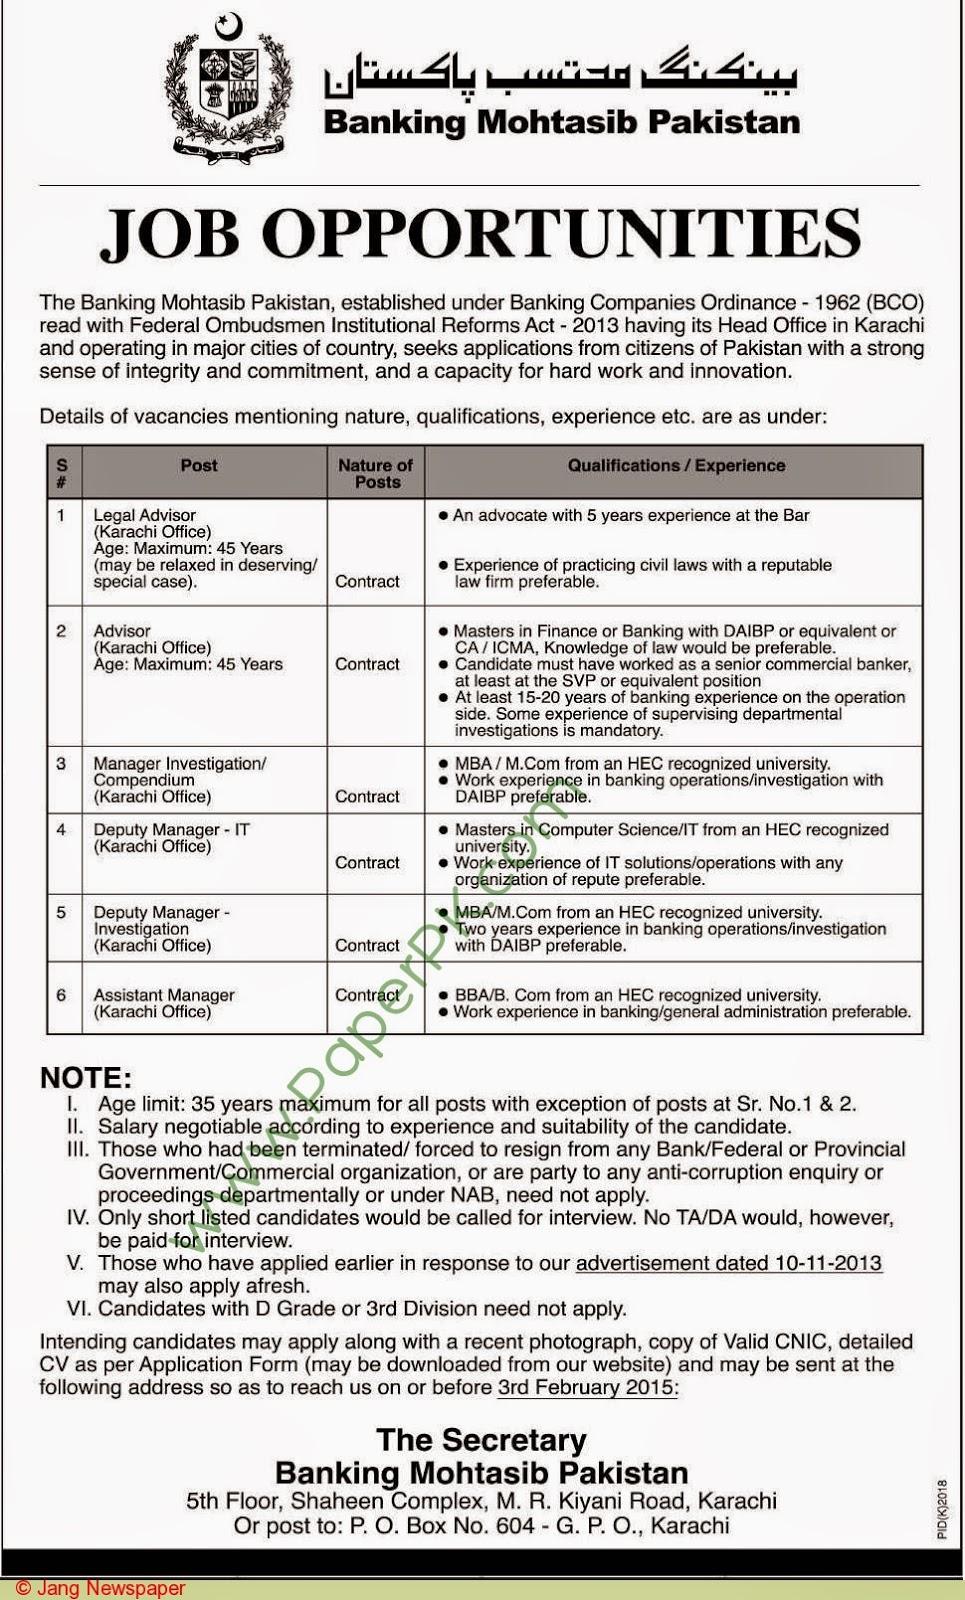 Banking Mohtasib Pakistan Karachi Jobs